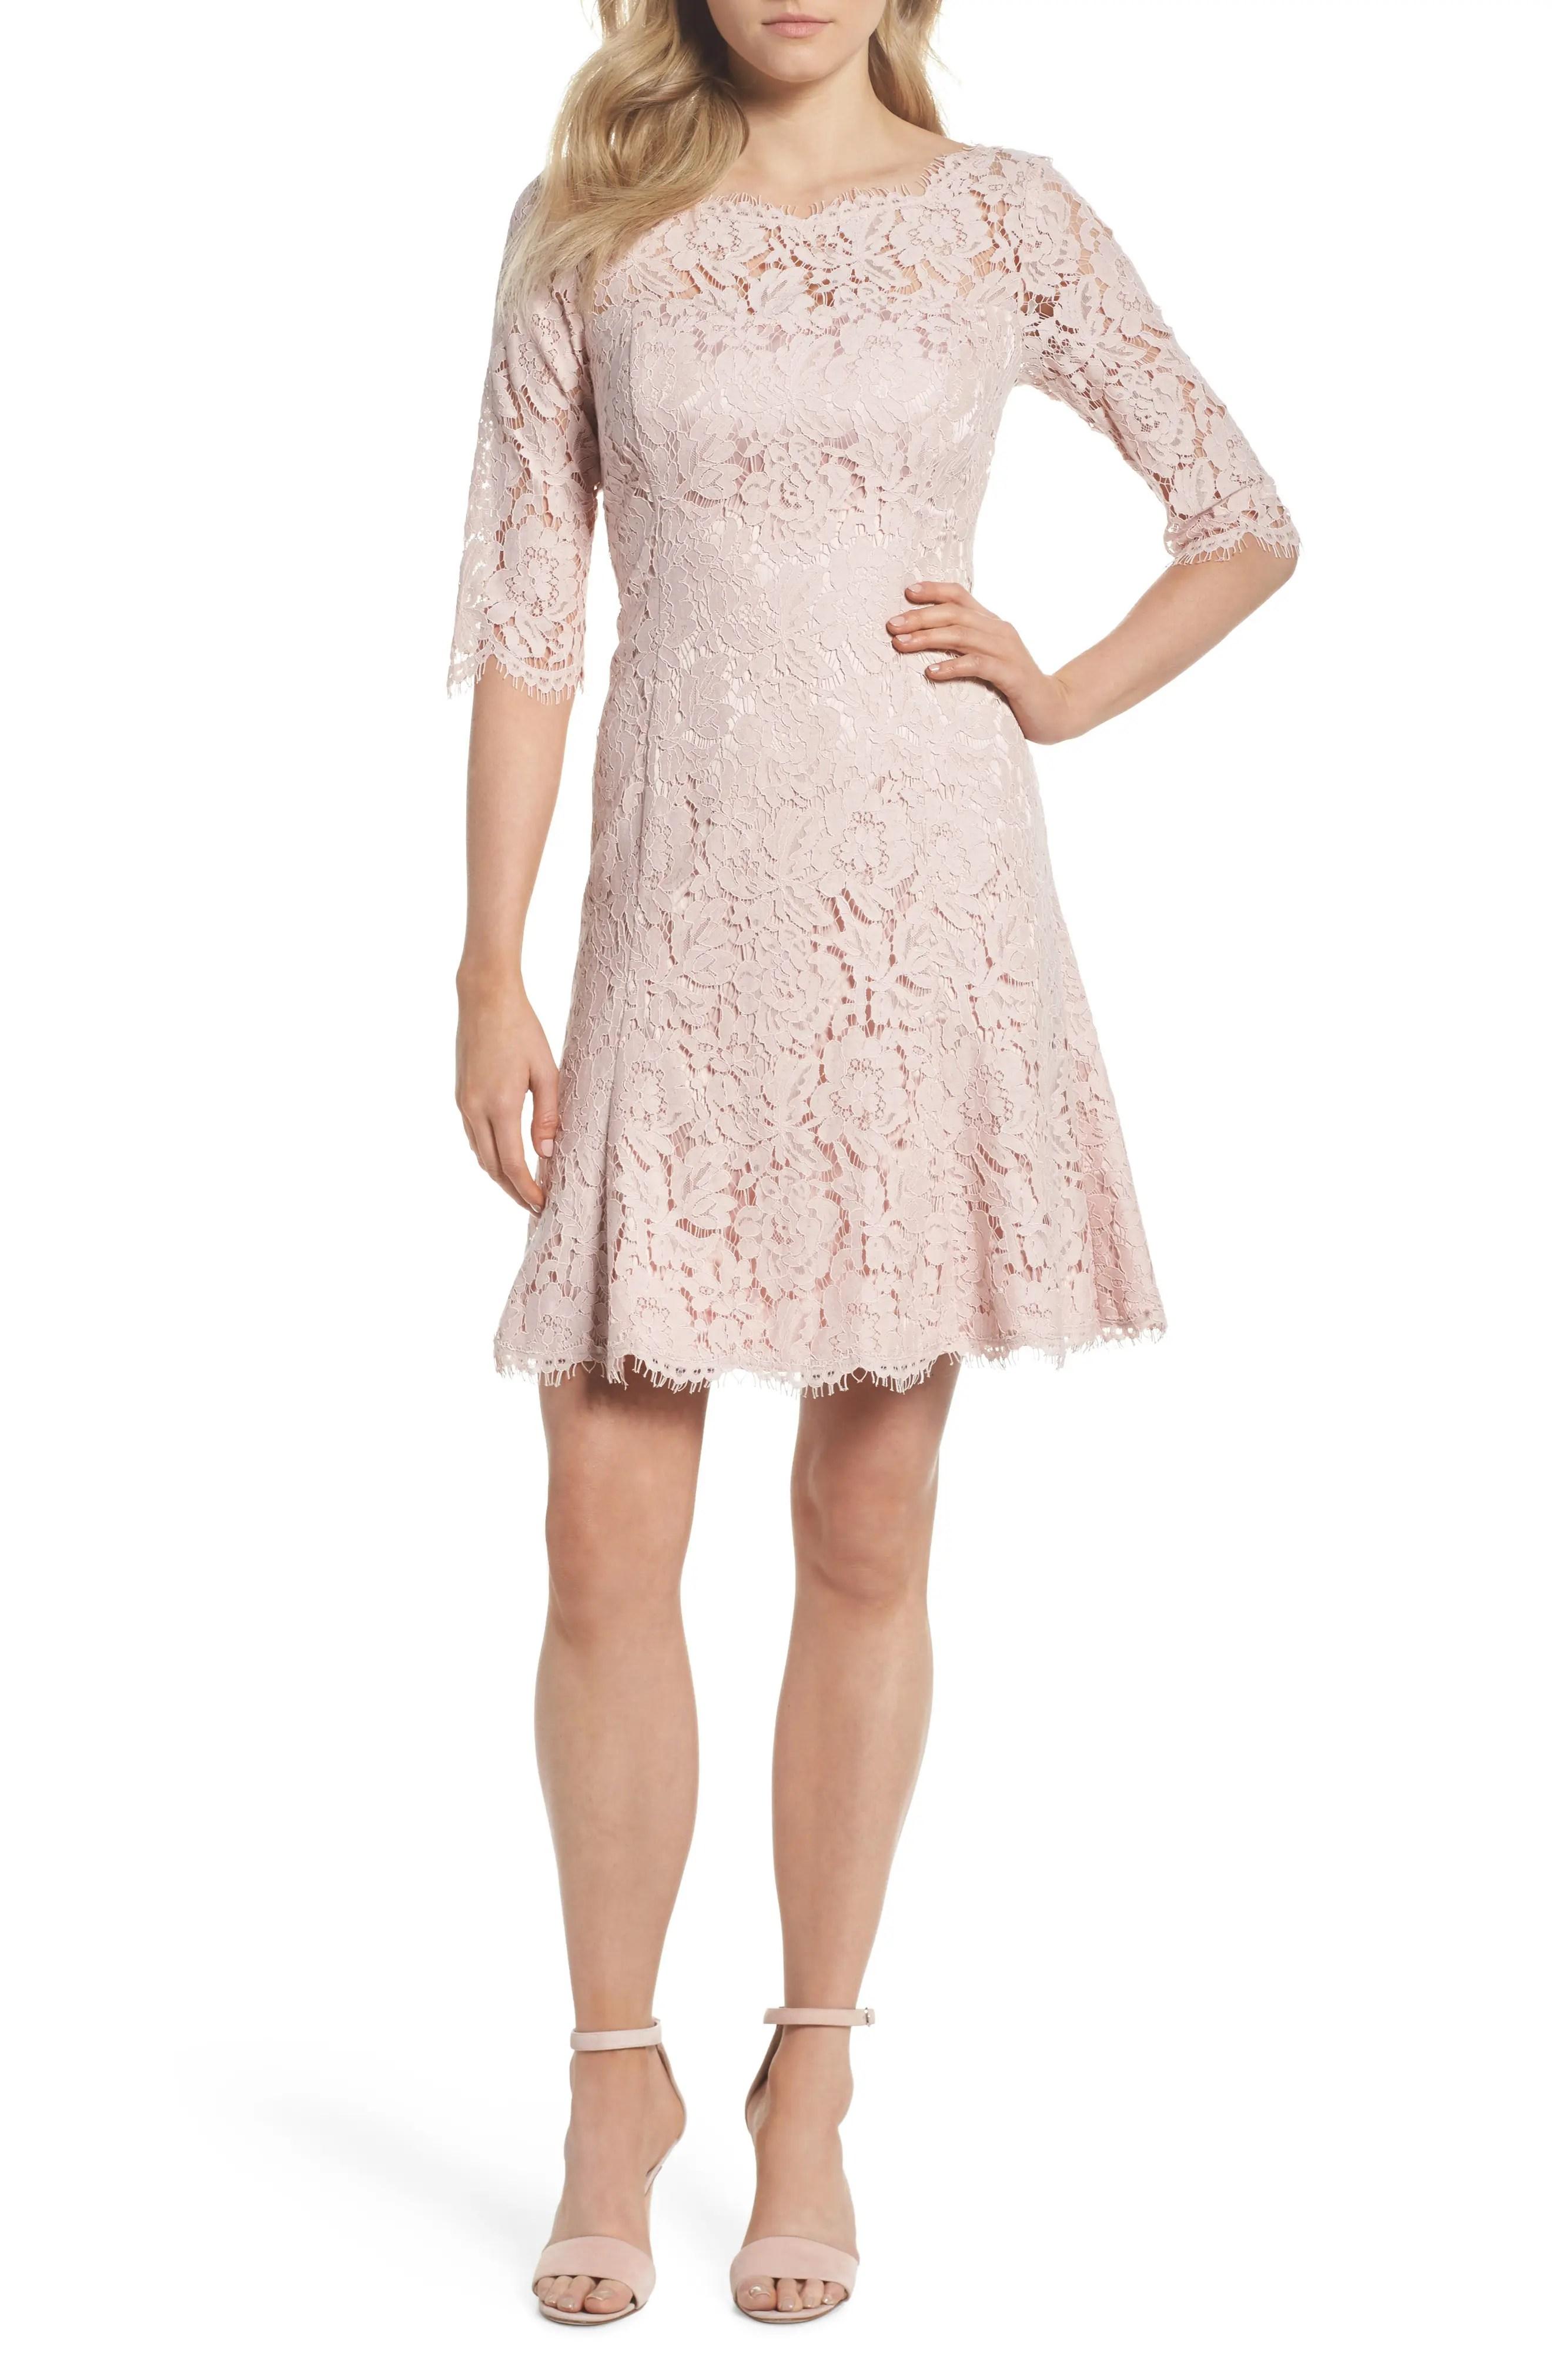 Eliza  lace fit  flare dress regular petite also women  dresses nordstrom rh shoprdstrom